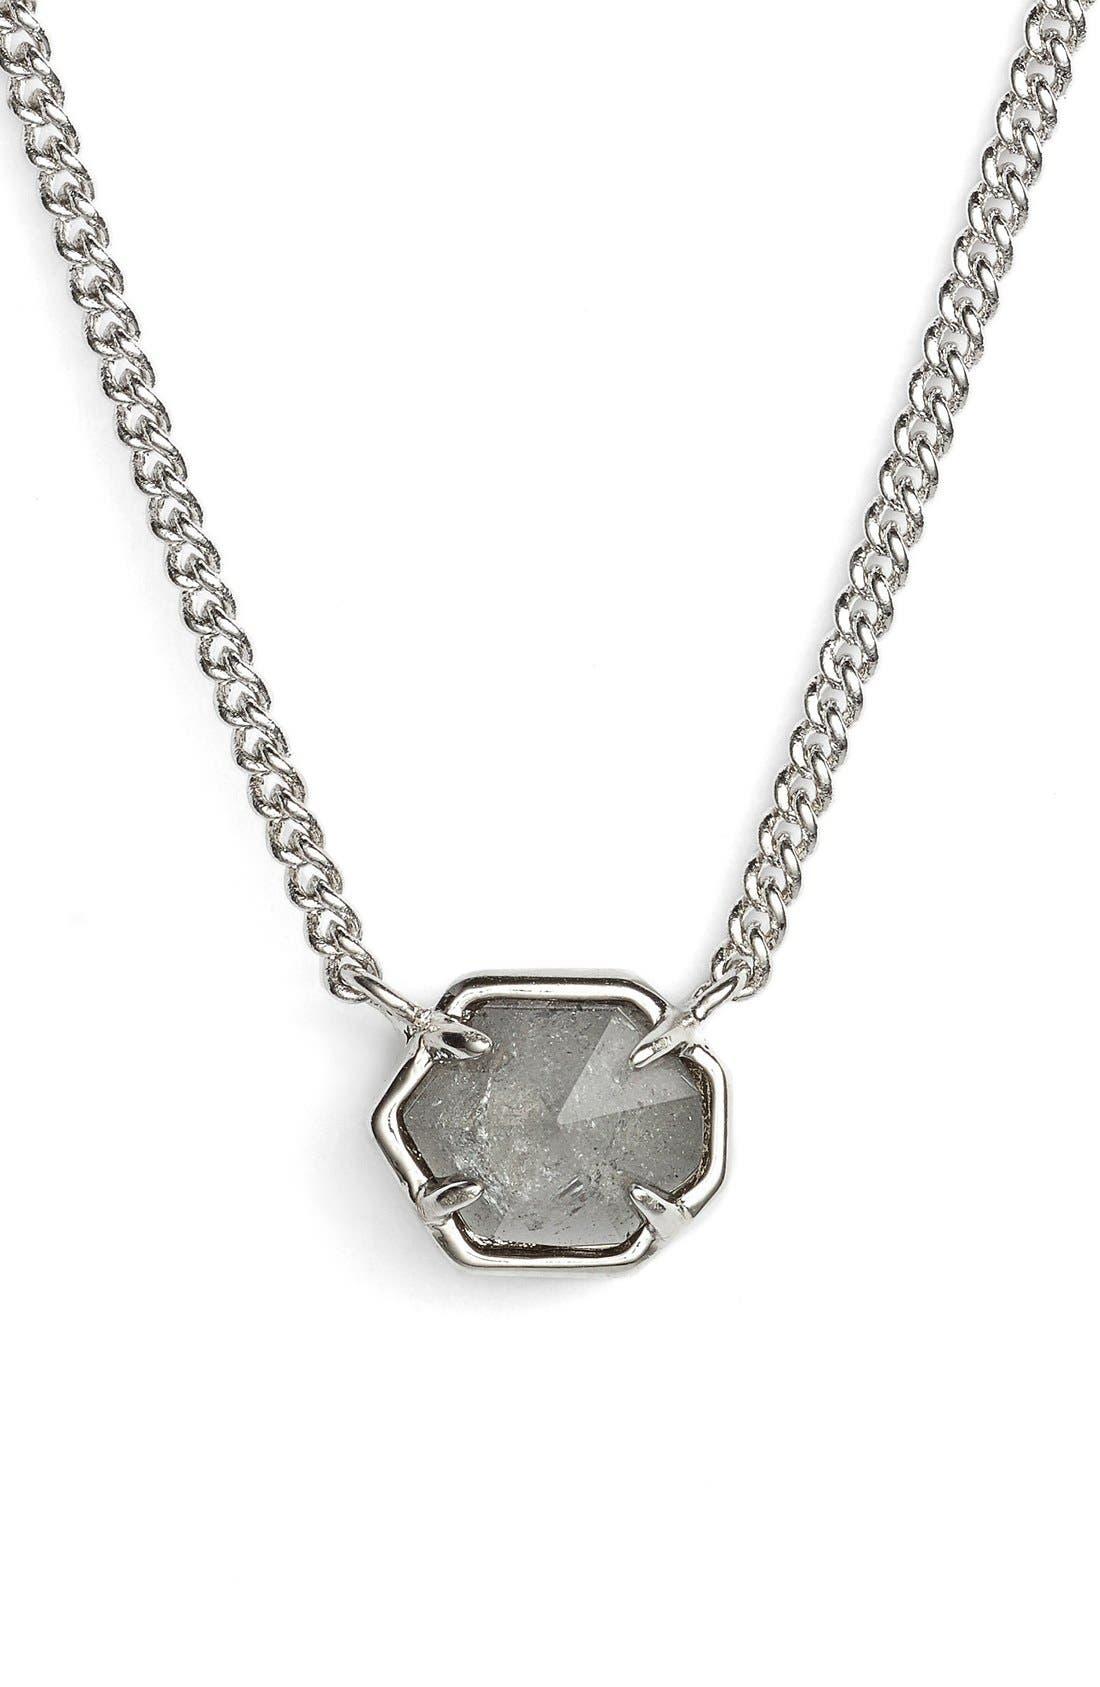 Main Image - Kendra Scott 'Mabel' Necklace